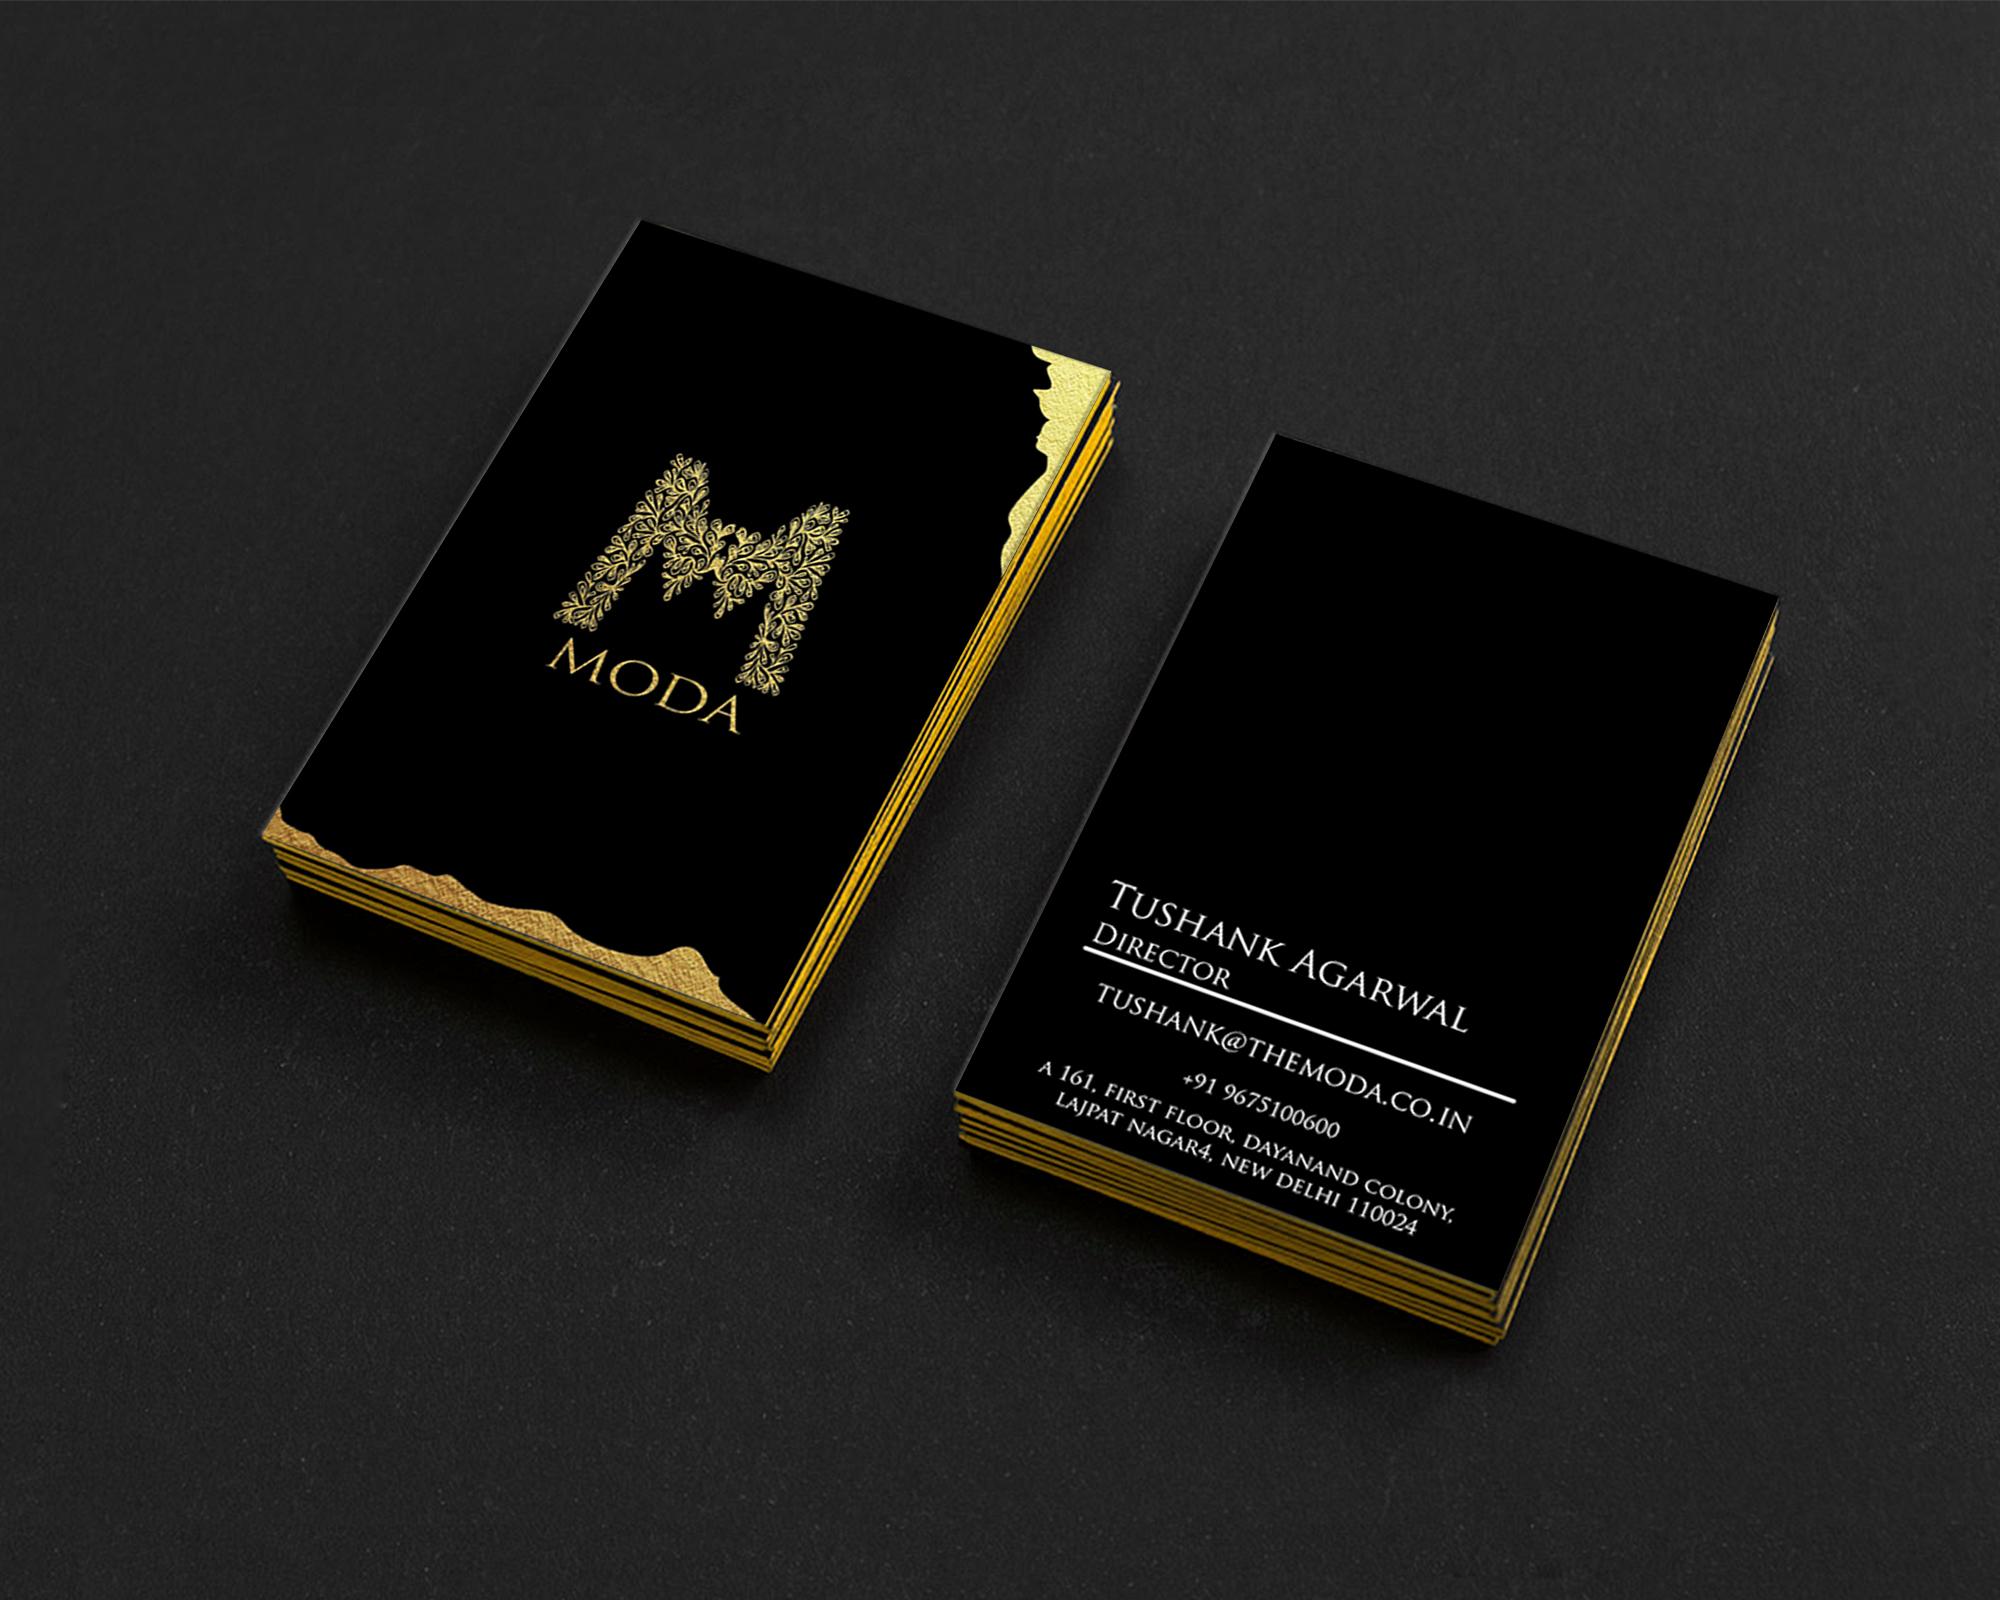 Black-Textured-Buisness-Card-Mockup-PSD.